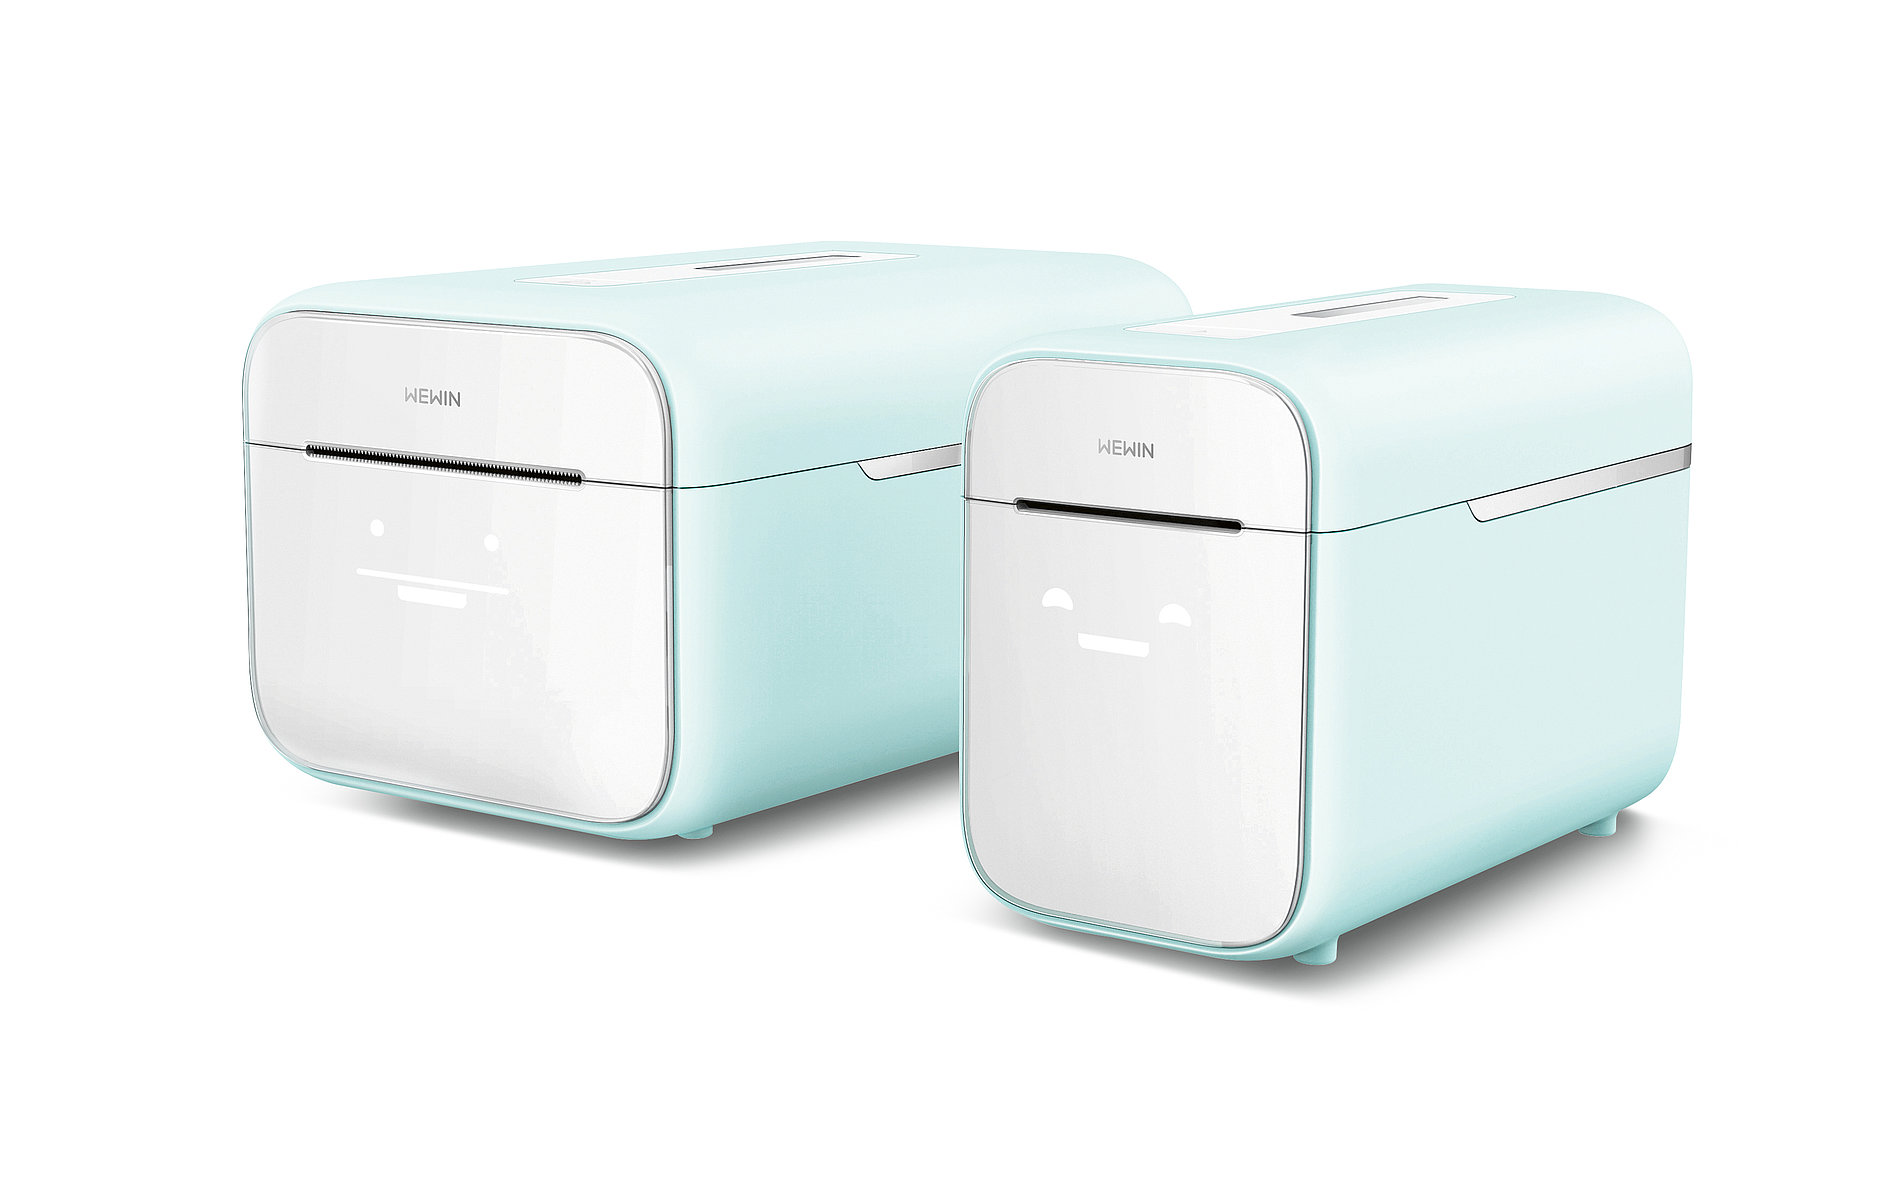 Medical Label Printer Series | Red Dot Design Award